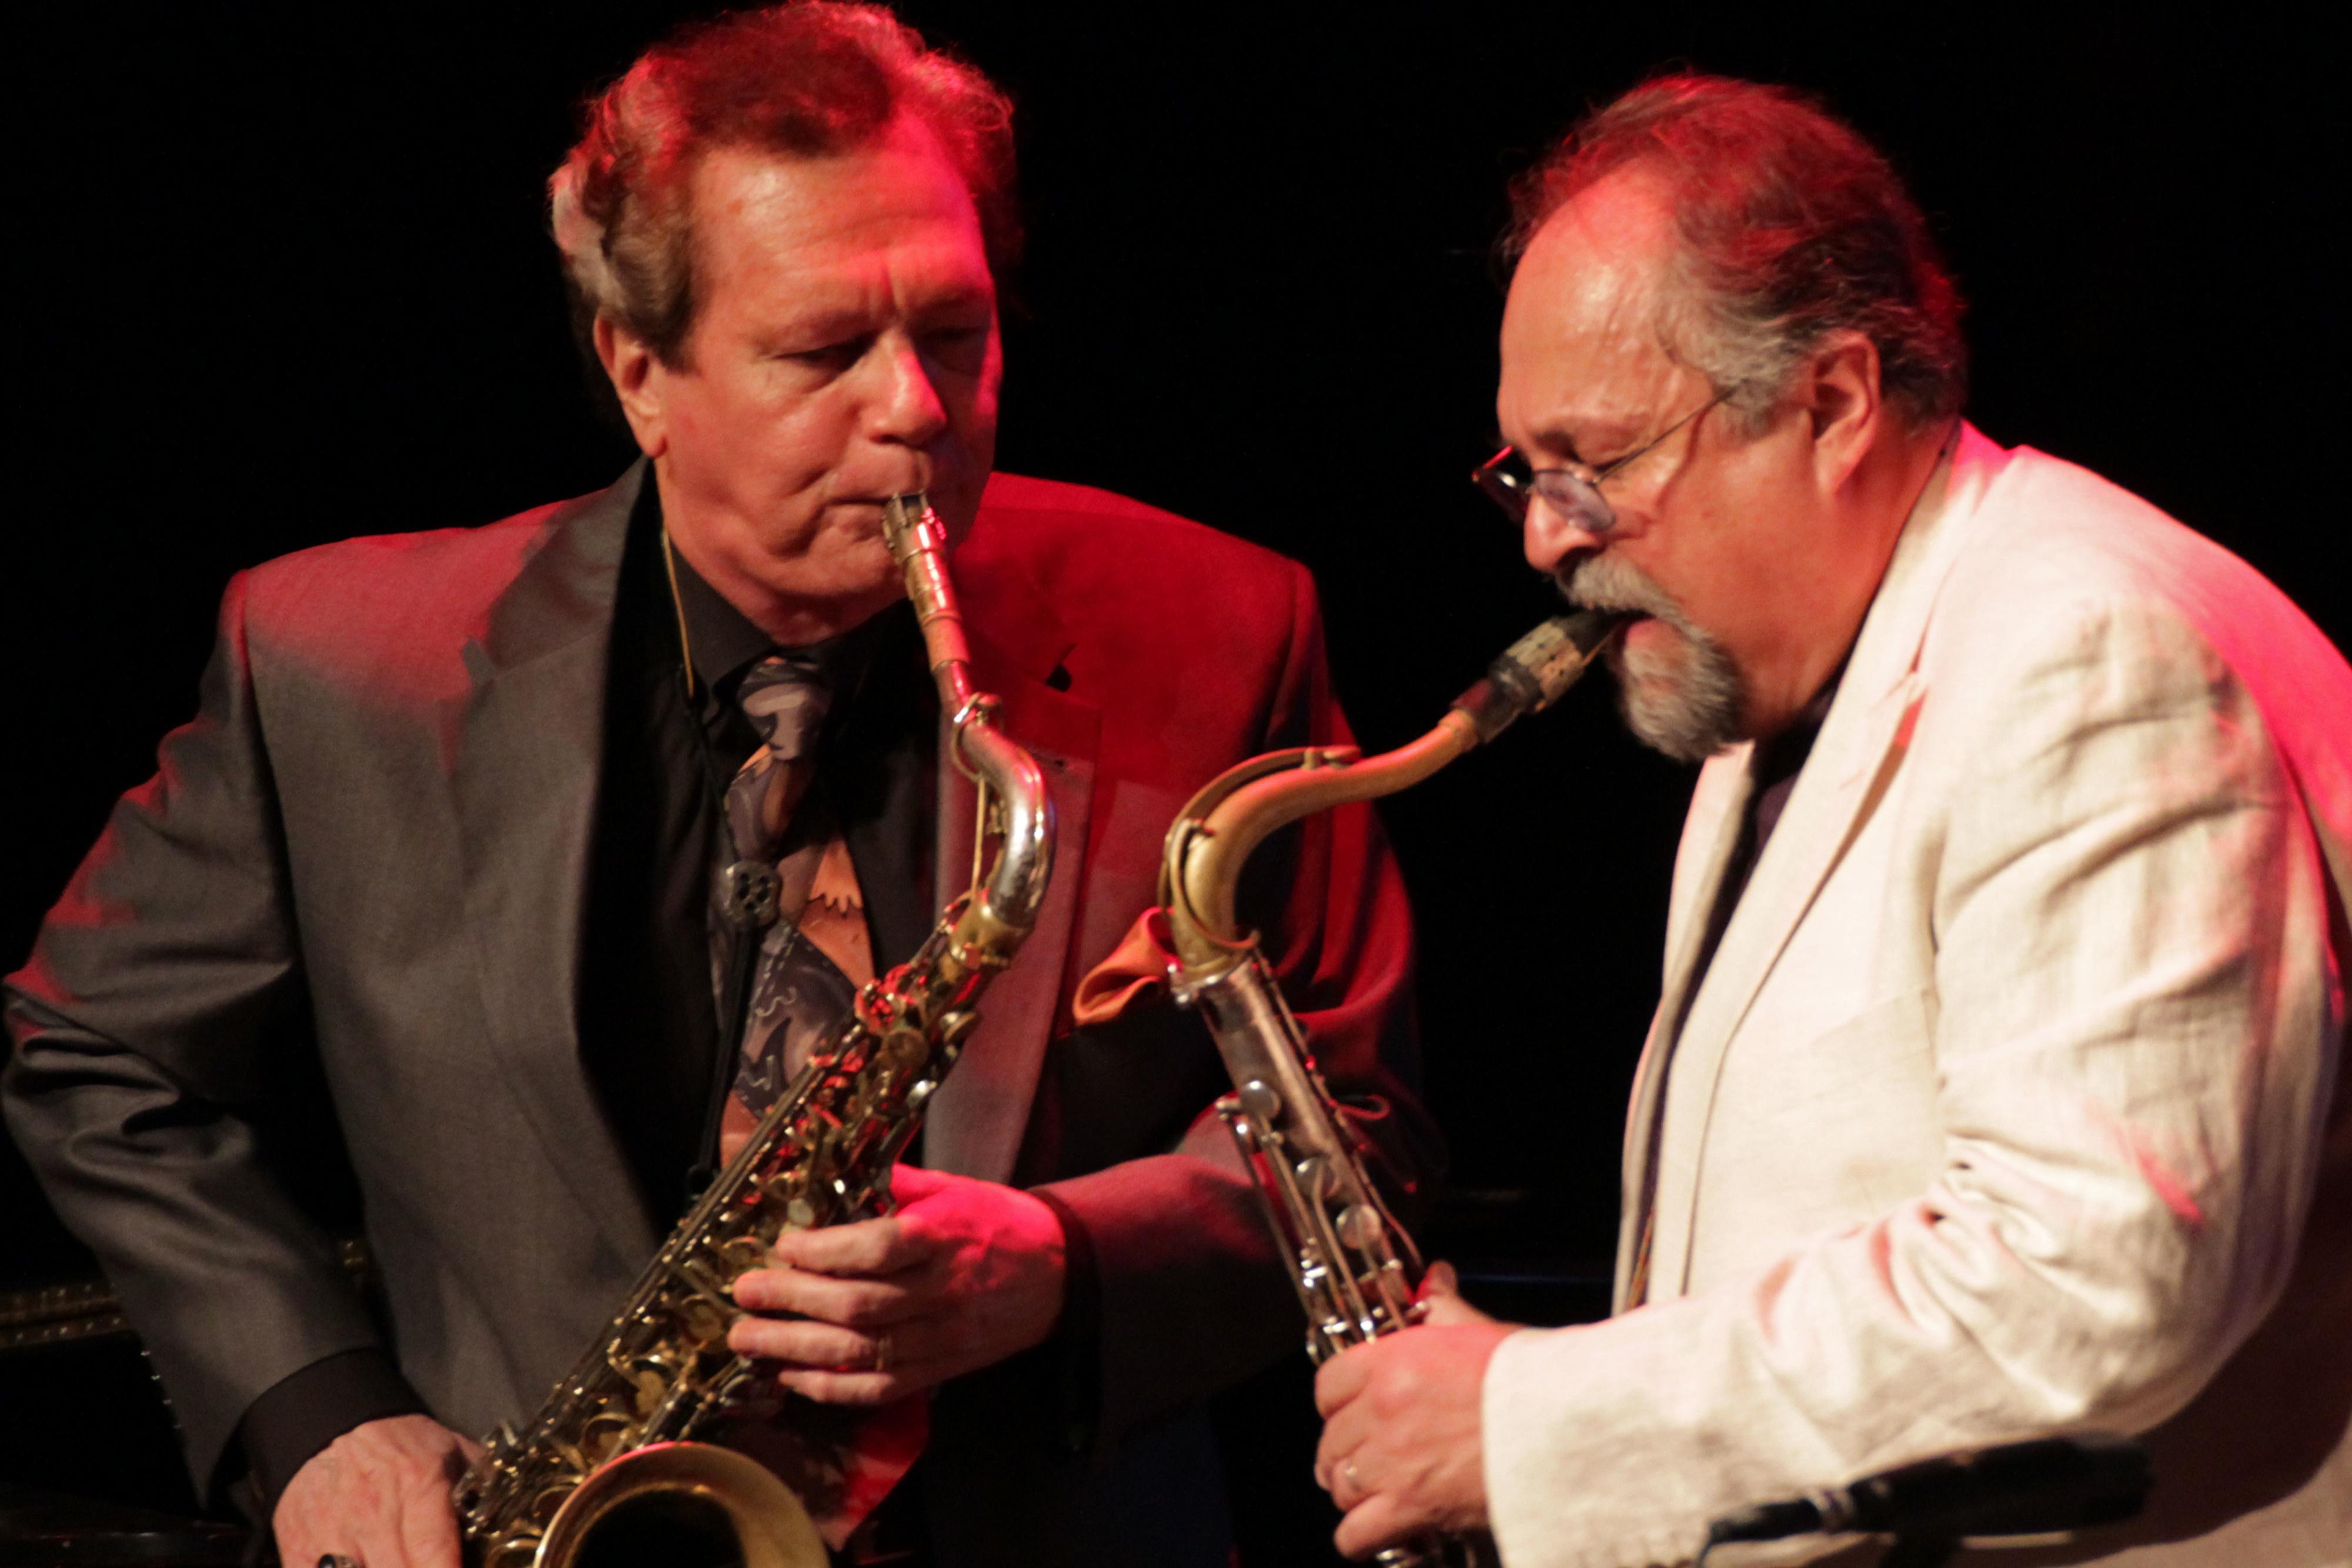 Ernie krivda and joe lovano at tri-c jazzfest cleveland 2013